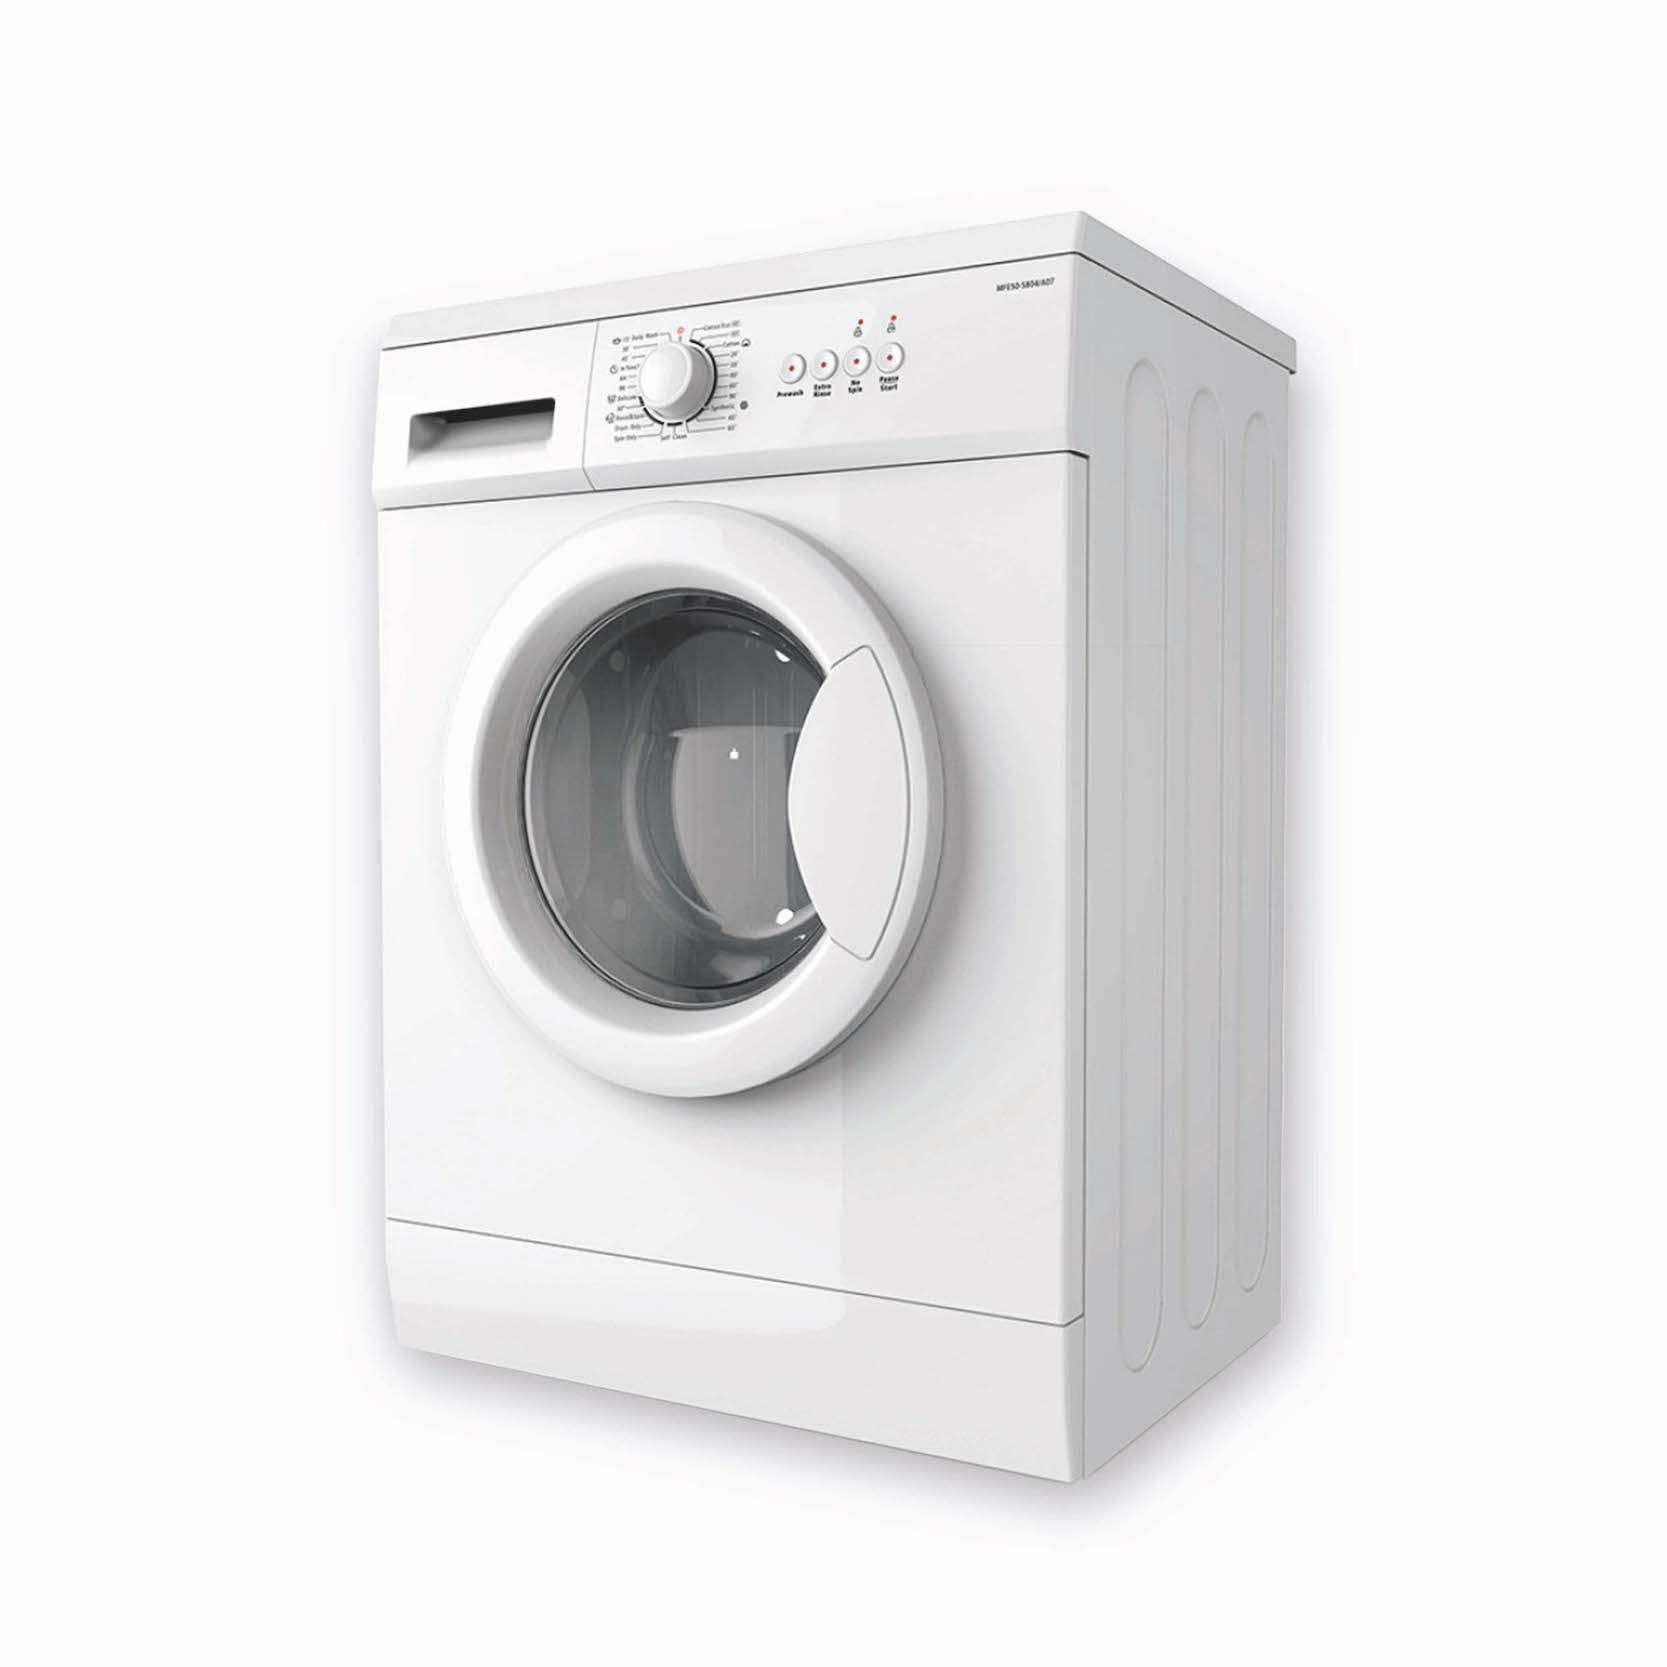 Midea 7kg Front Load Dryer